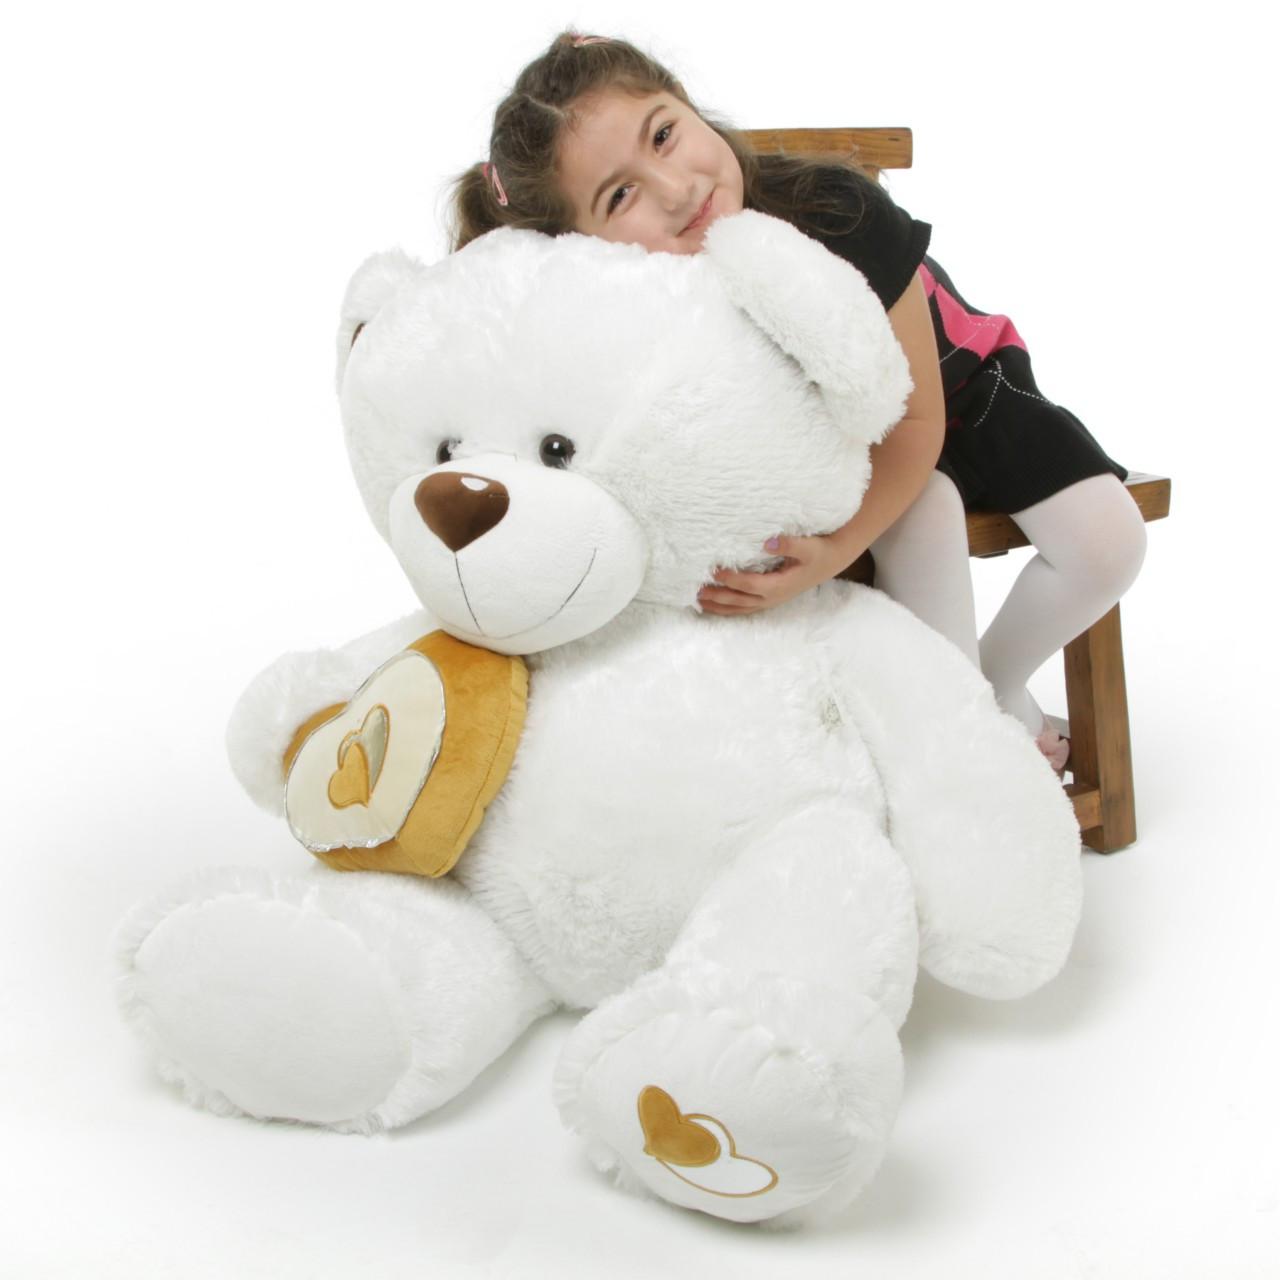 Chomps Big Love 42 White Valentine Teddy Bear Giant Teddy Bears